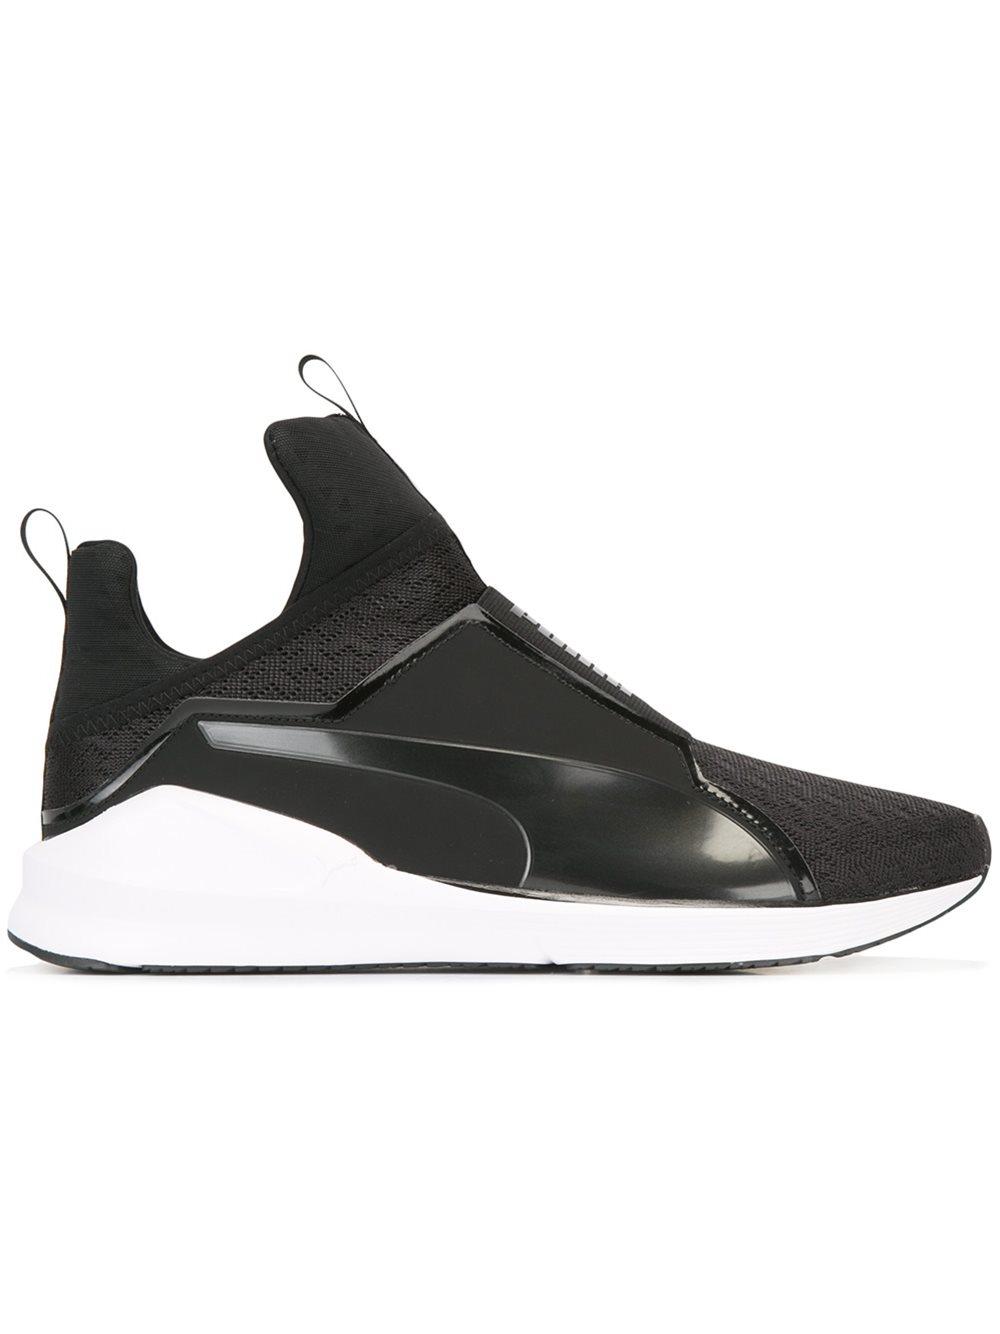 puma slip on sneakers in black lyst. Black Bedroom Furniture Sets. Home Design Ideas